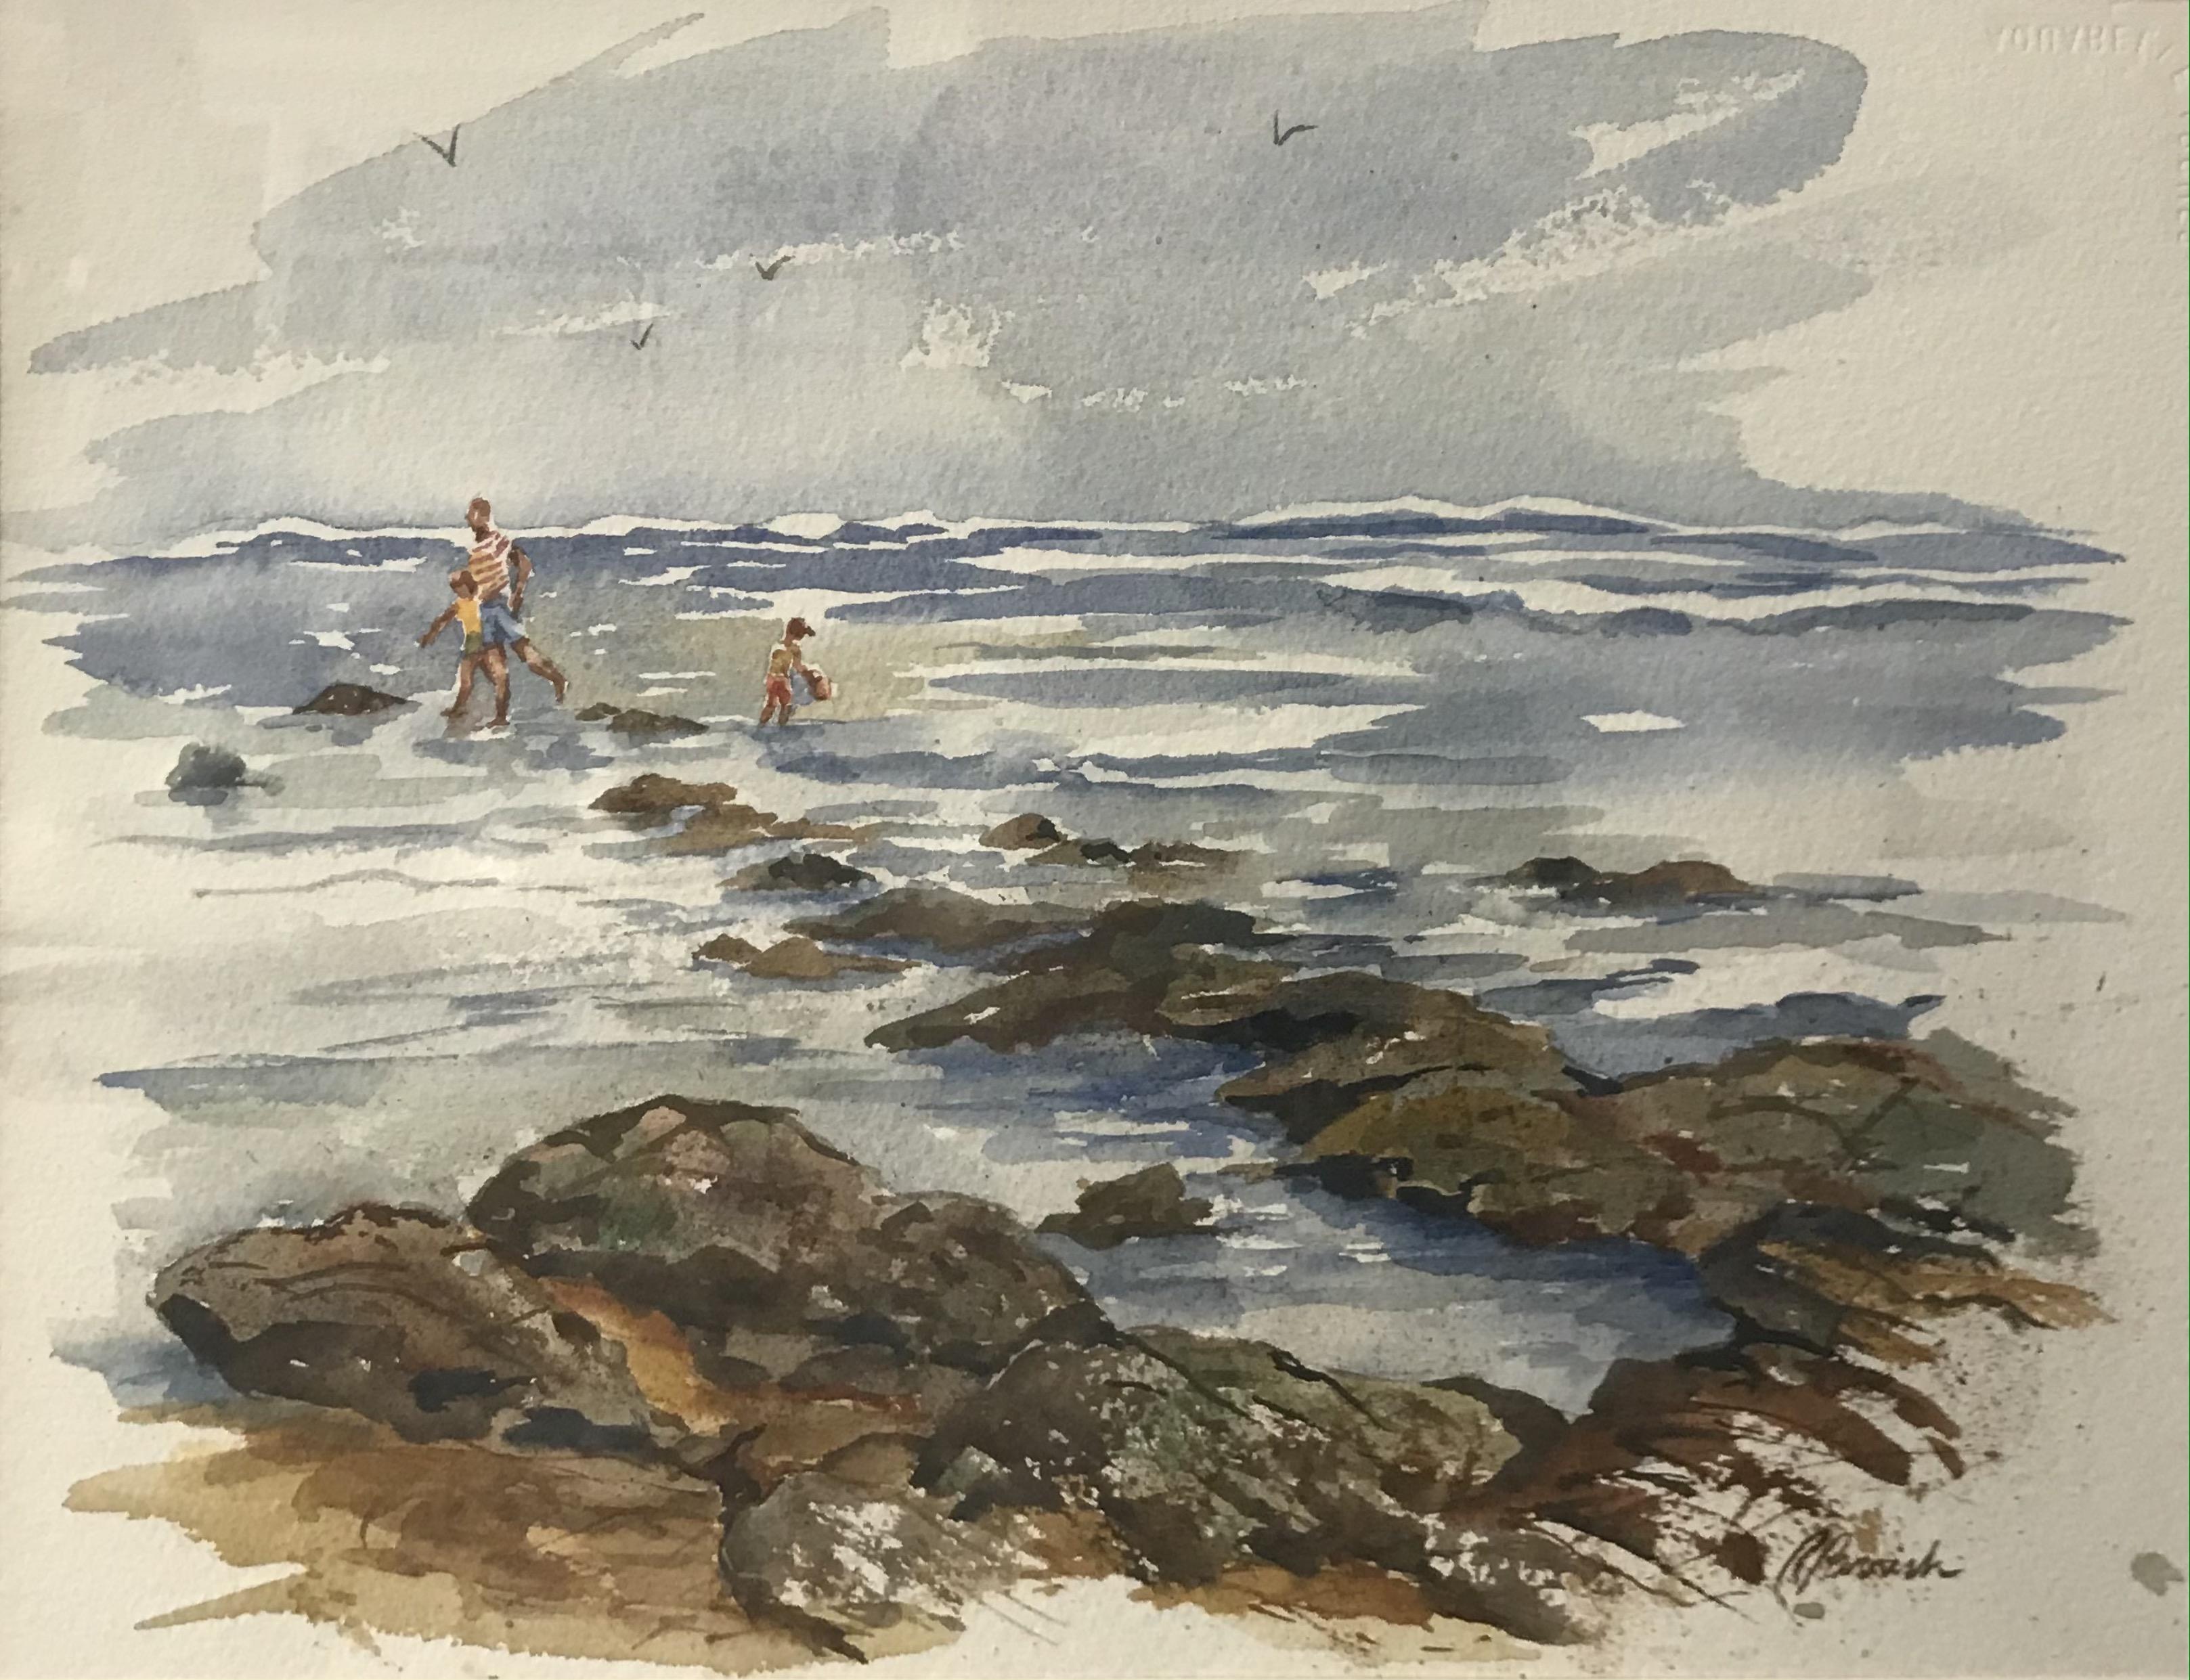 'Beach at Washington Oaks', watercolor by Rosamond Parrish ($350)